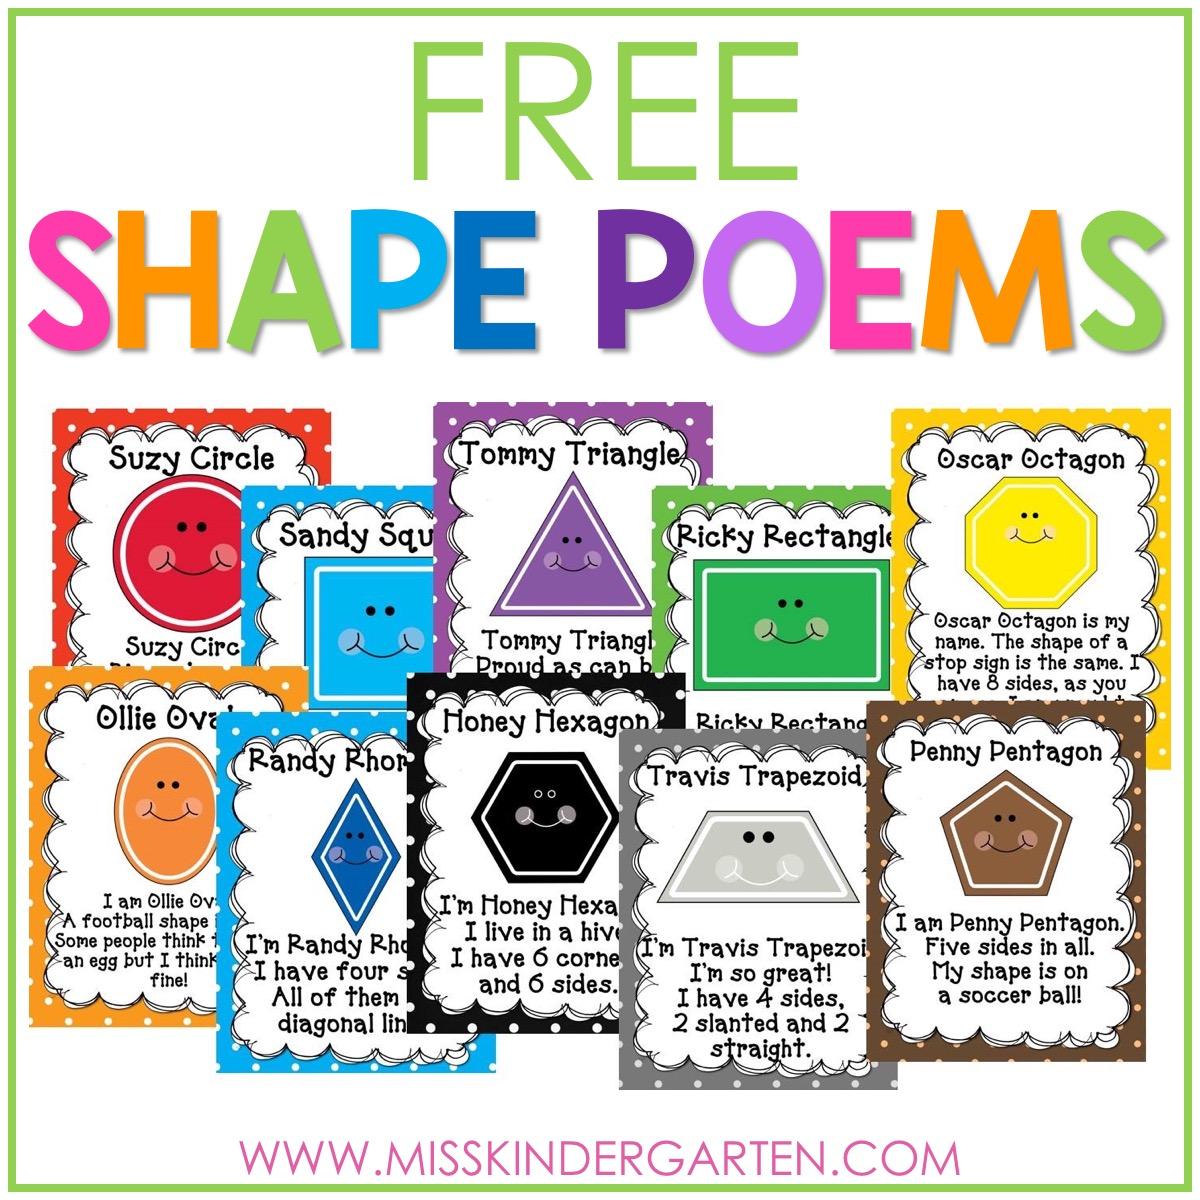 hight resolution of 2D Shape Poems Free Download - Miss Kindergarten